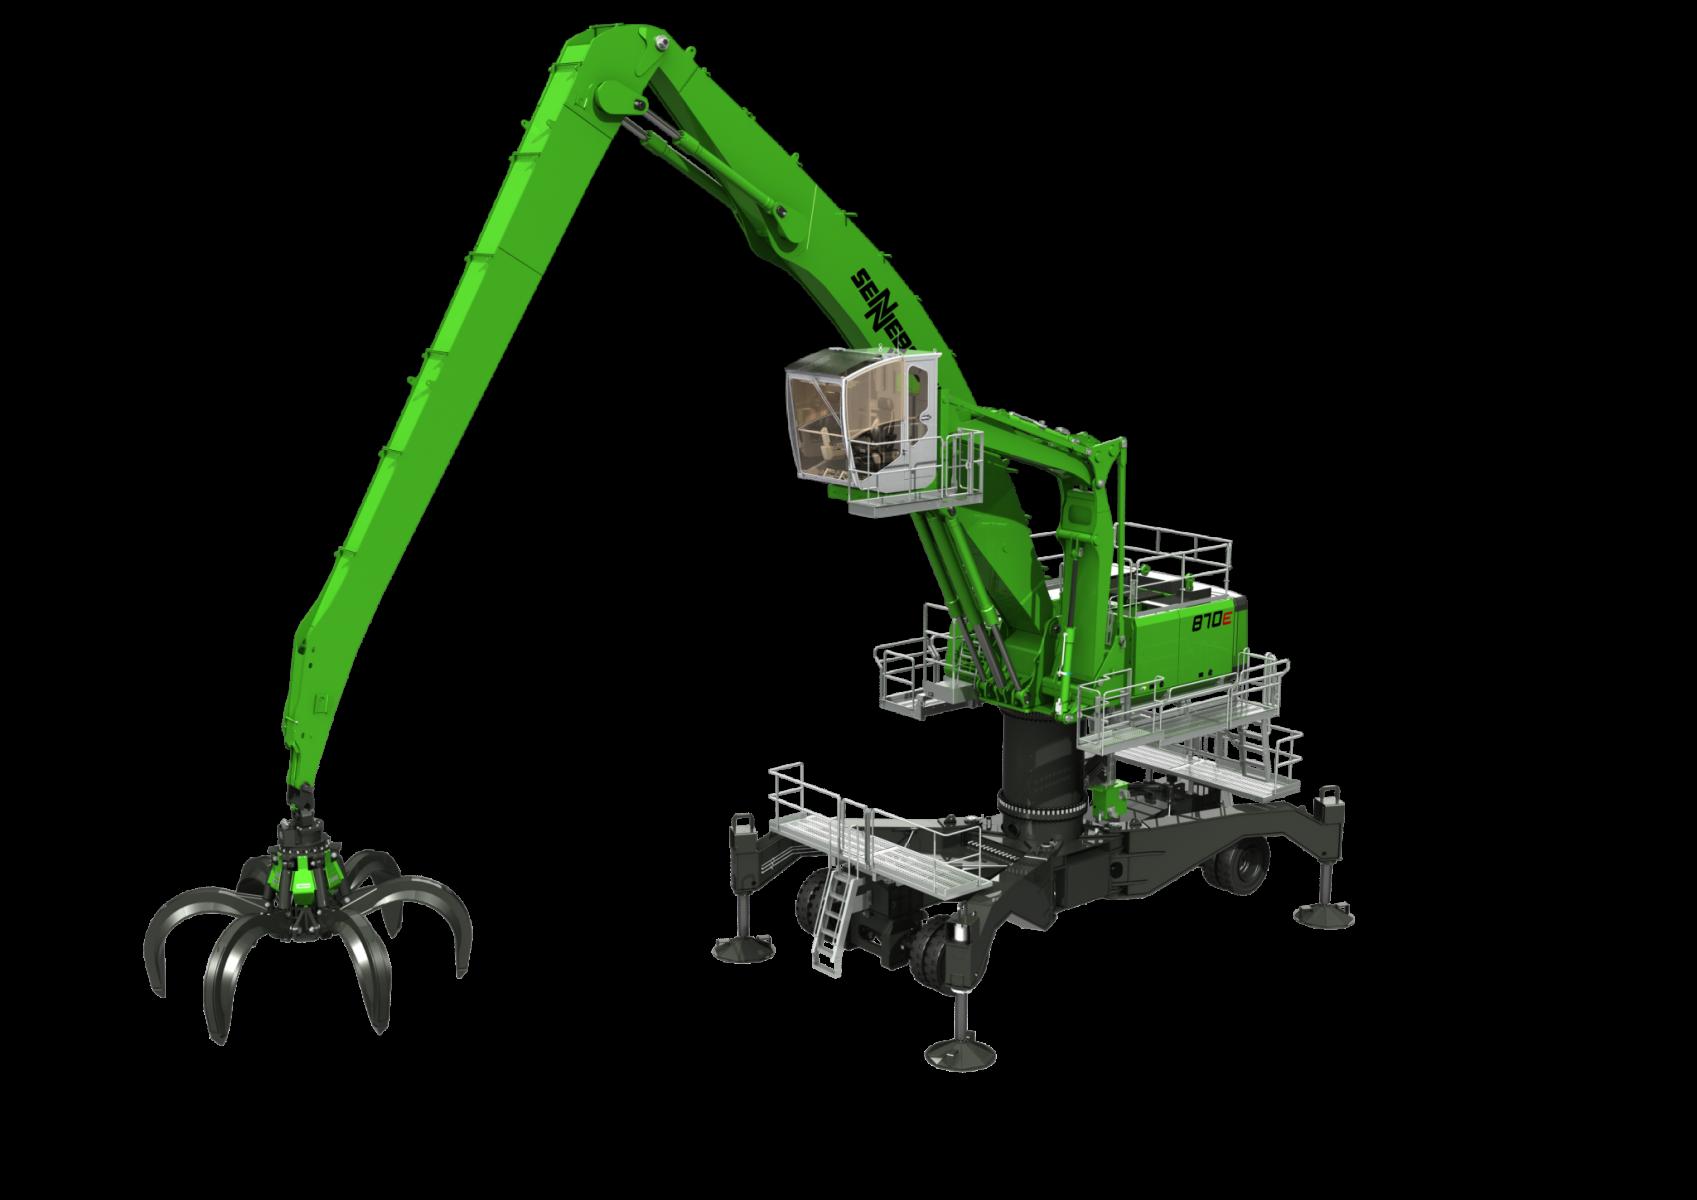 Sennebogen Mobile Material Handling Machine 870E model- SMT